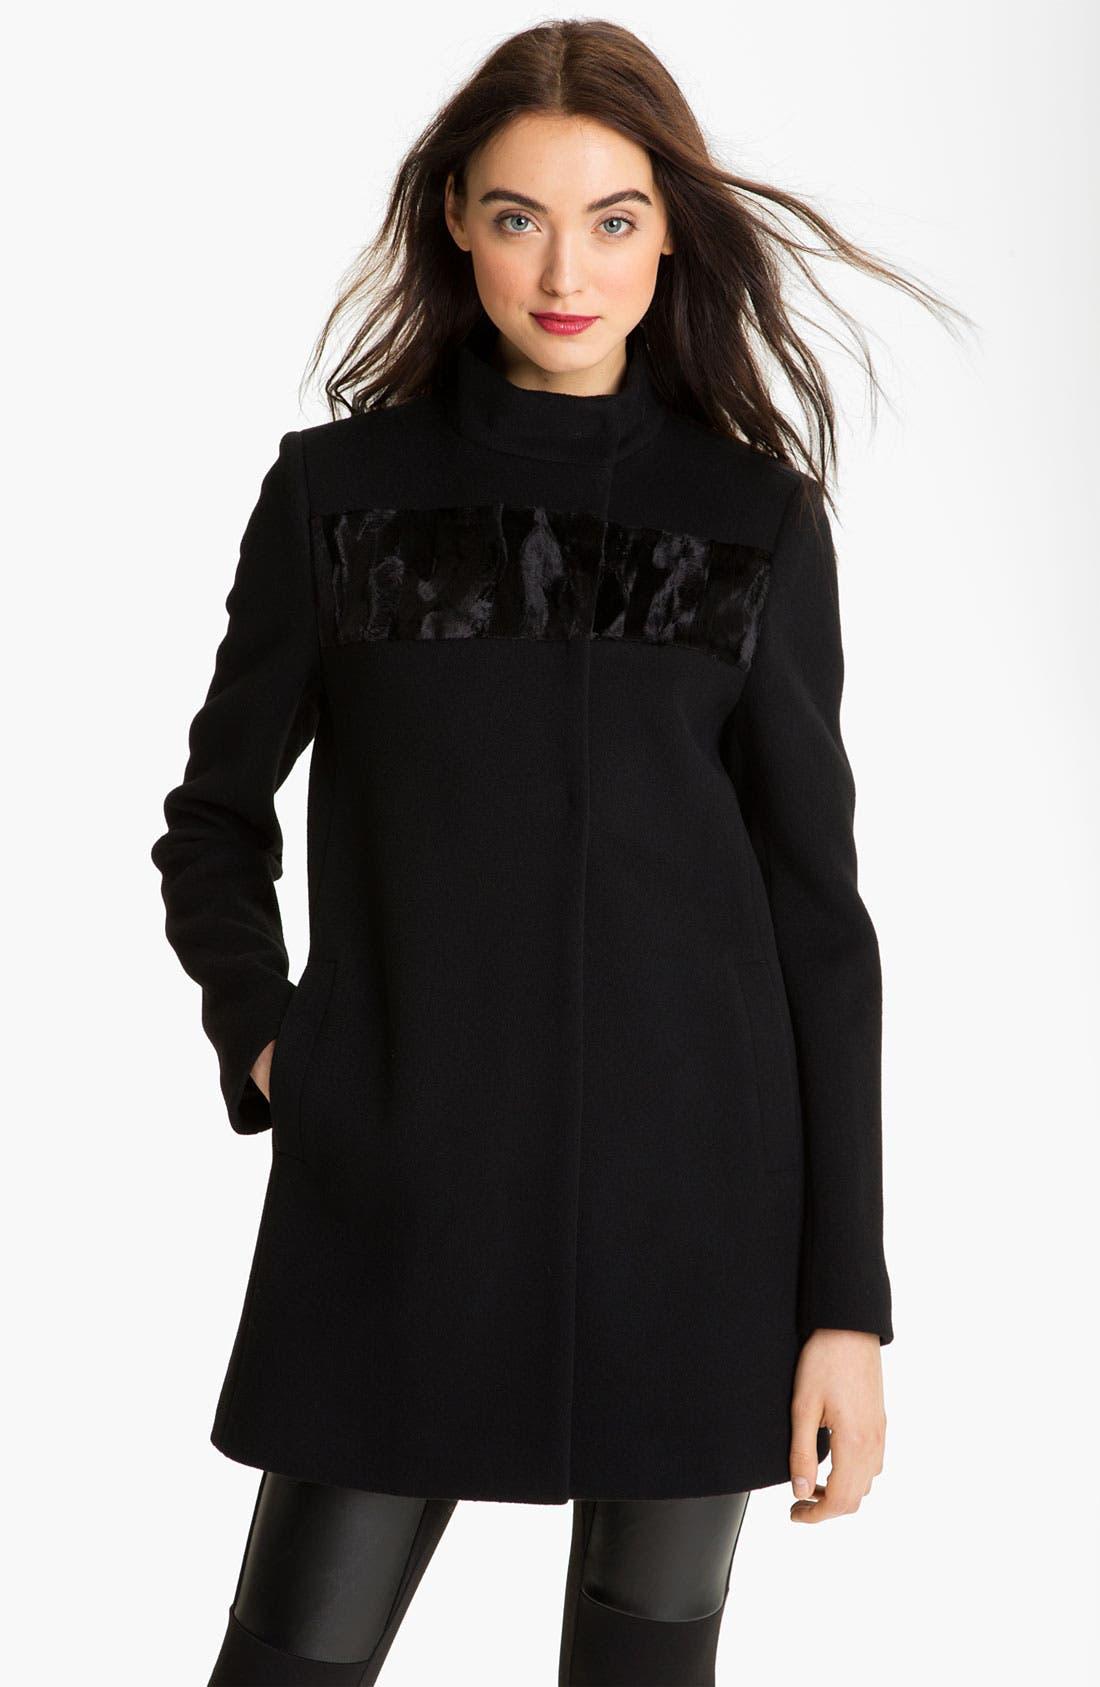 Main Image - Elie Tahari Wool Coat with Faux Fur Detail (Petite) (Online Exclusive)